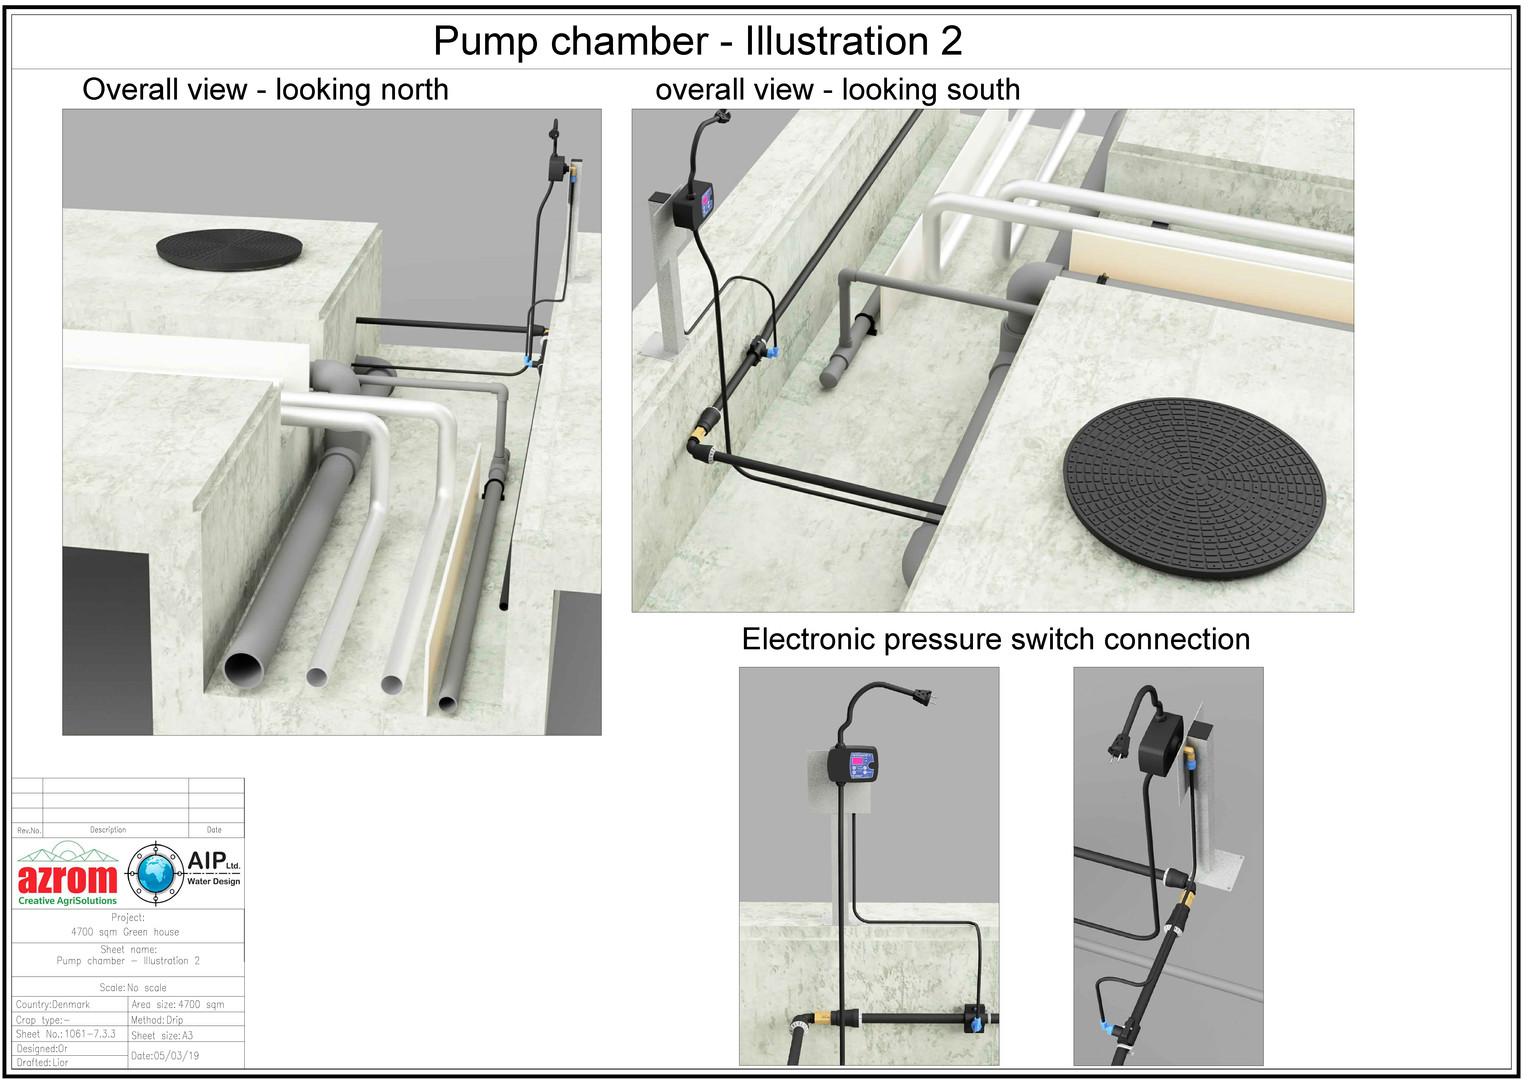 1061-7.3.3- Pump chamber illustration 2.